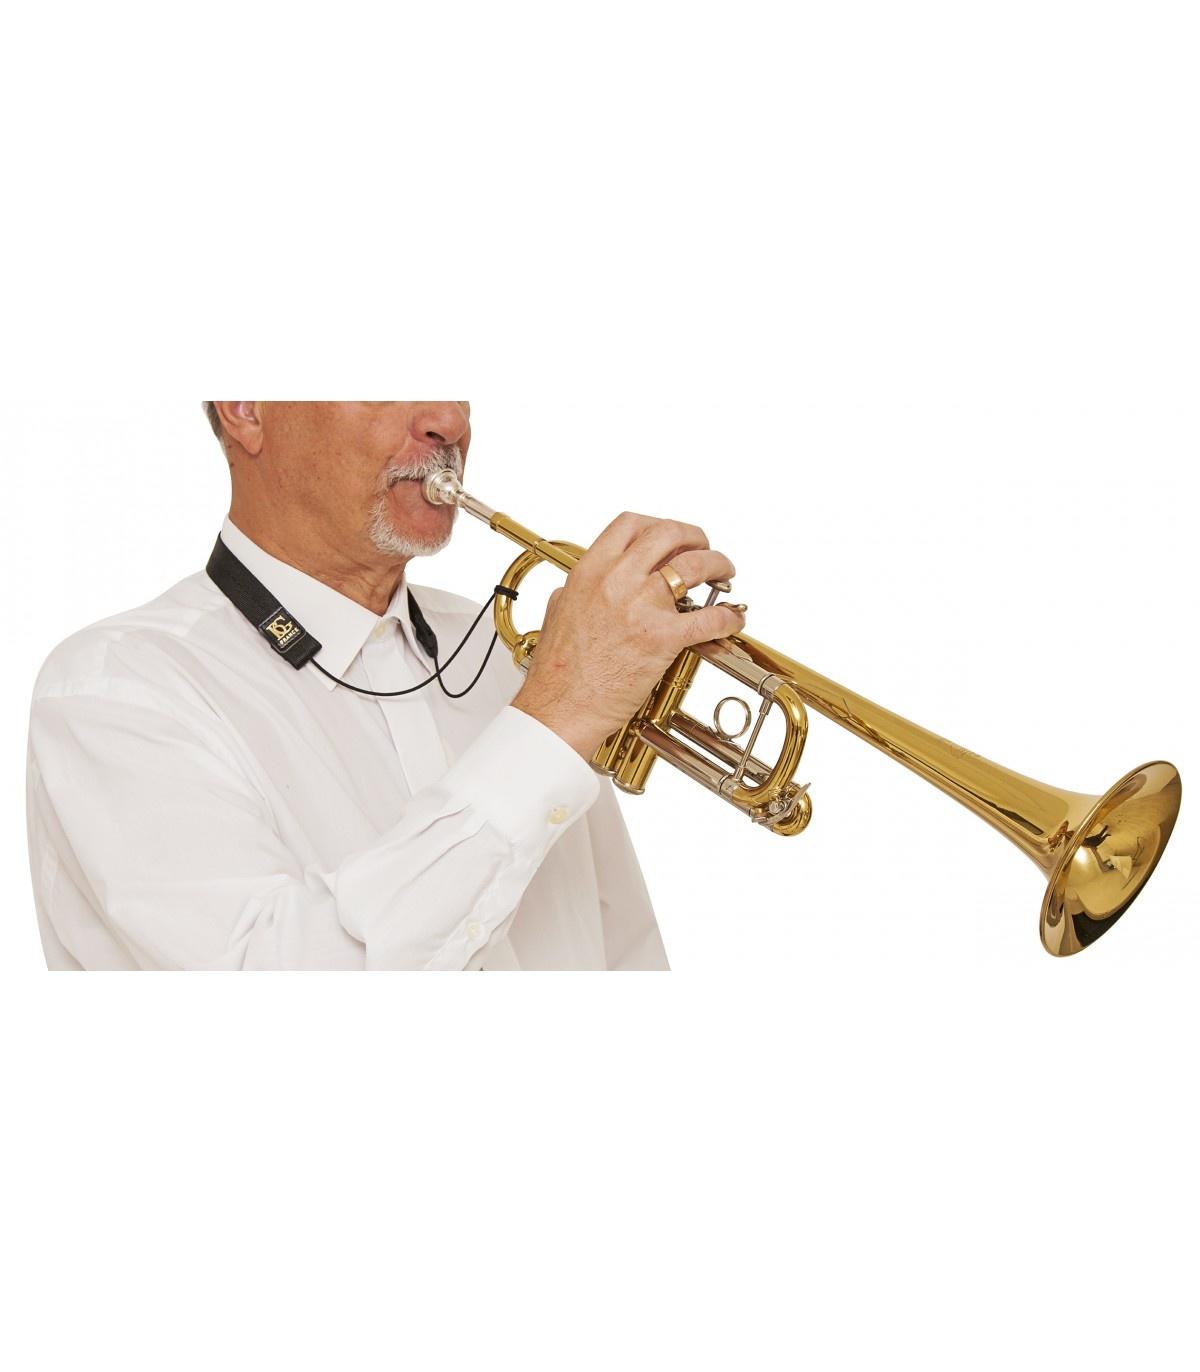 BG France BG TF1 Flex Neck Strap for Trumpet/Cornet/Bugle